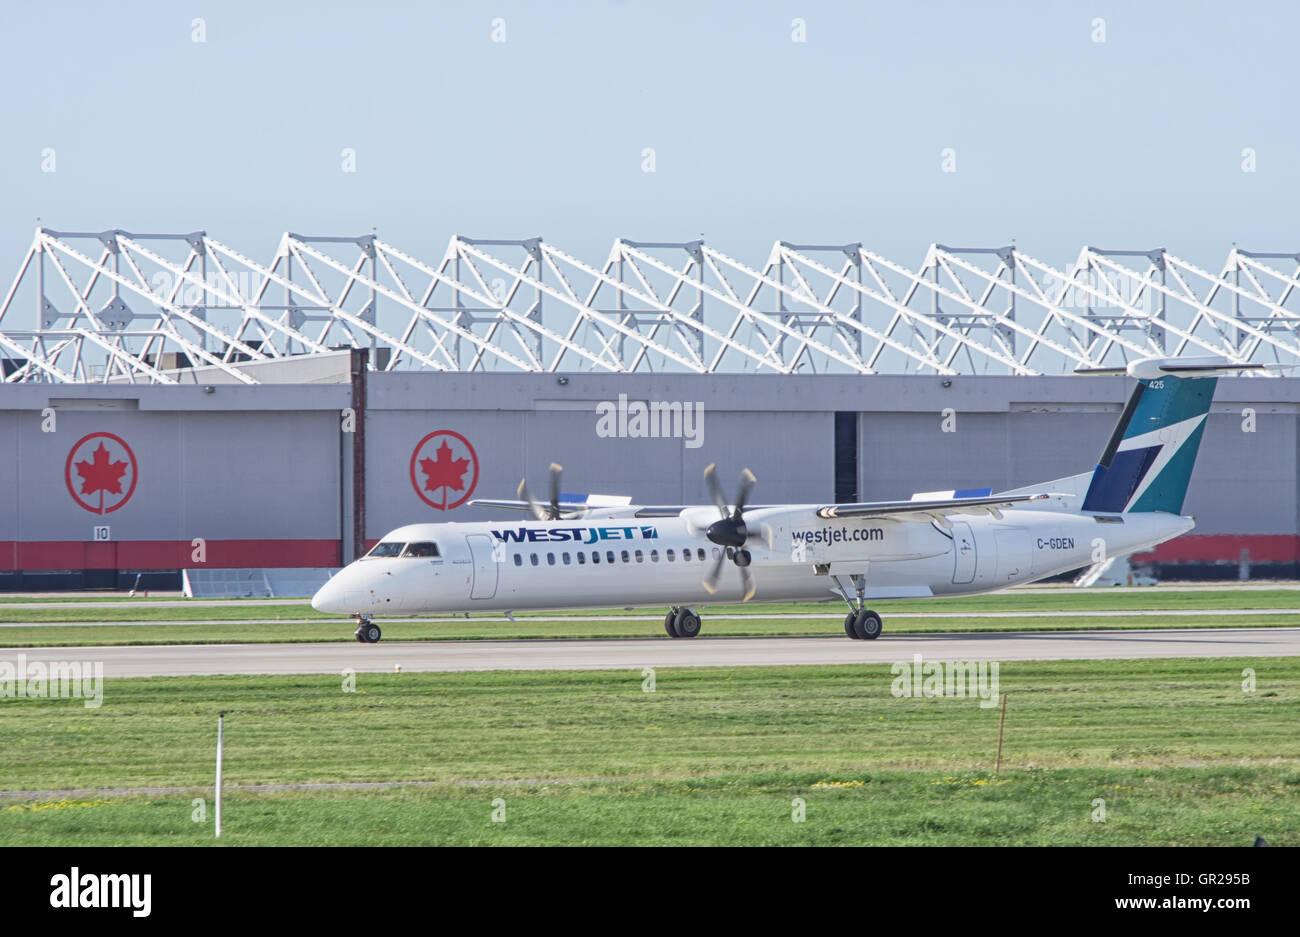 Westjet Turboprop engine aircraft departing near an Air Canada hangar at Montreal Pierre Elliott Trudeau - Stock Image